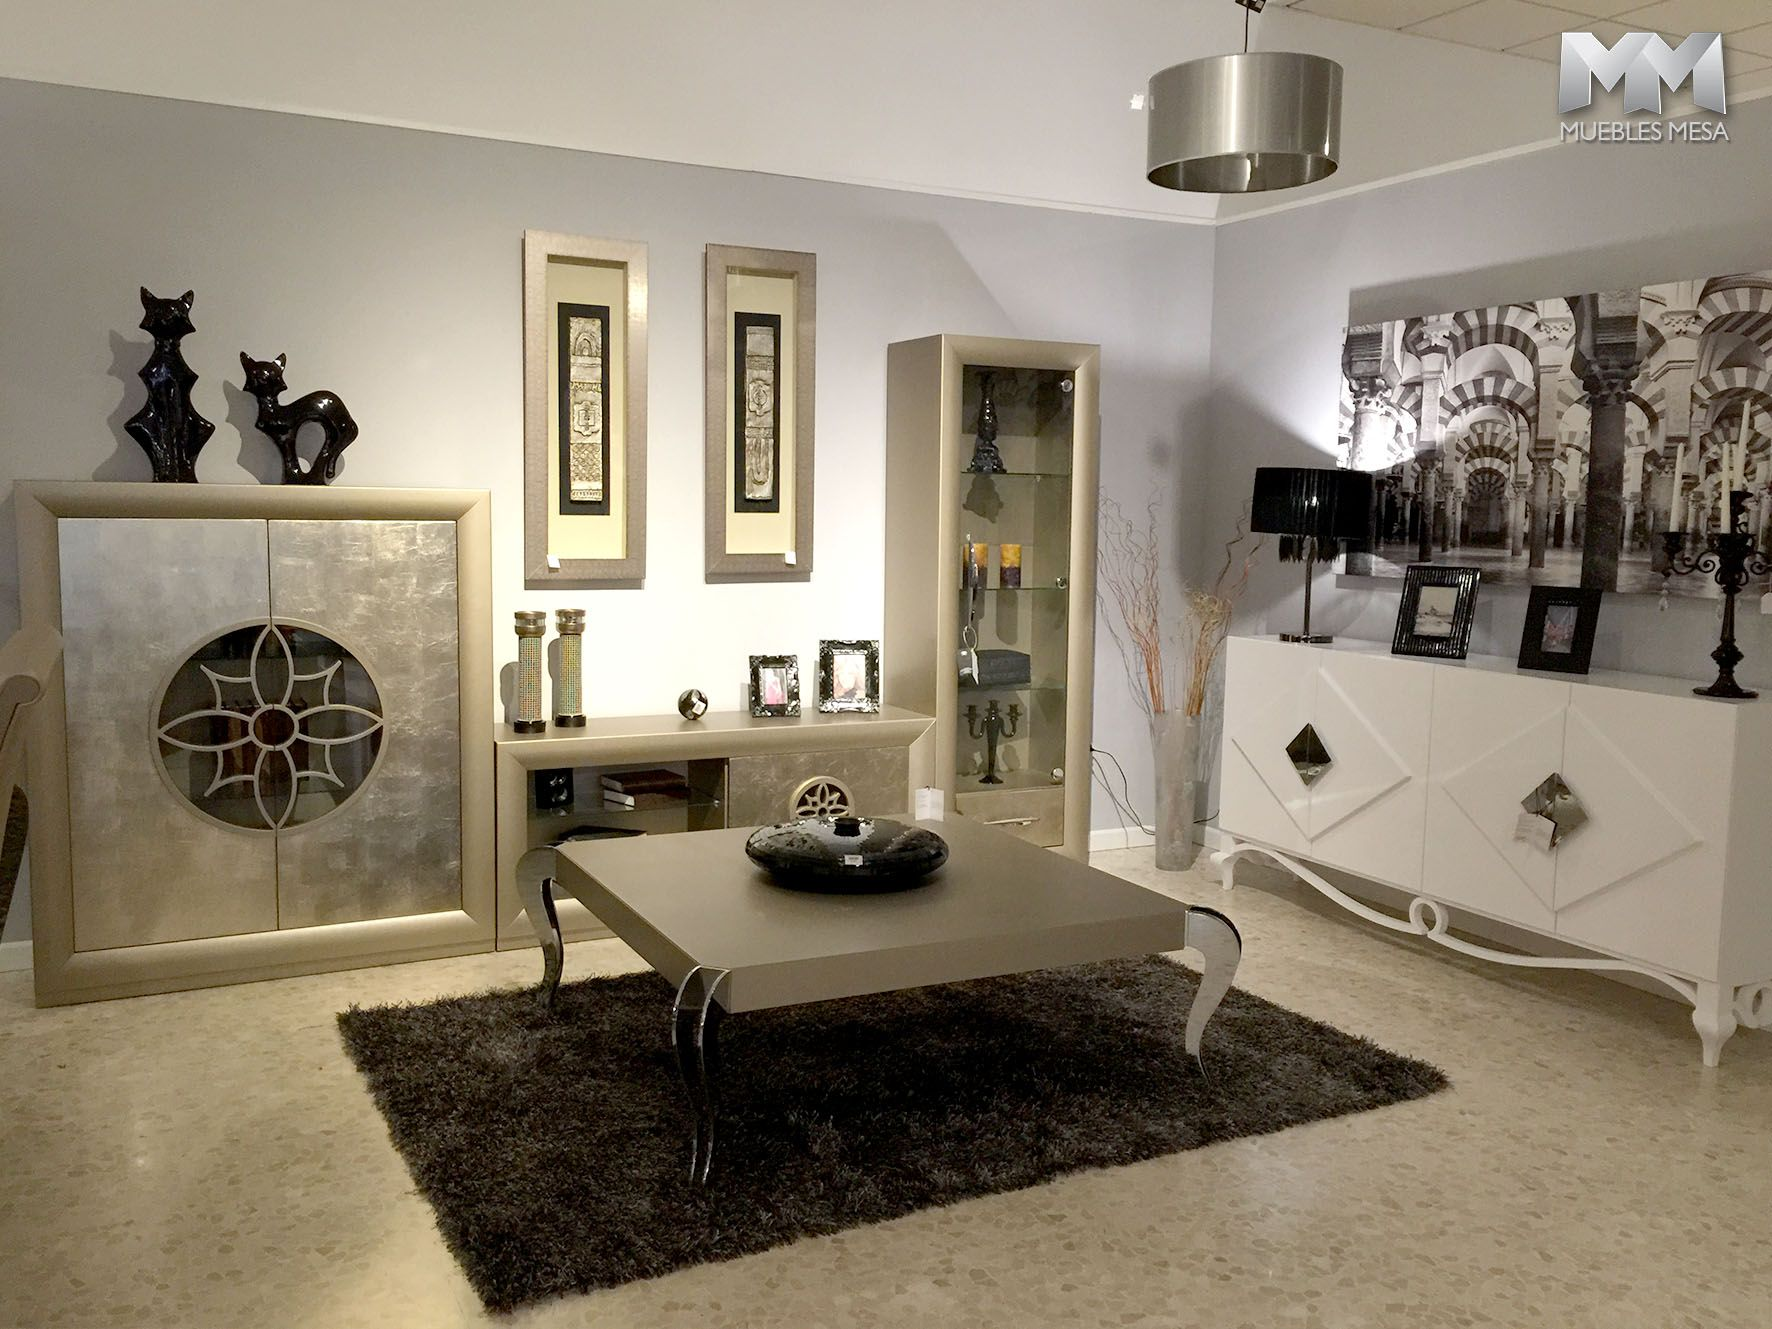 Muebles franco furniture en la exposici n de muebles mesa for Muebles clasicos en lucena